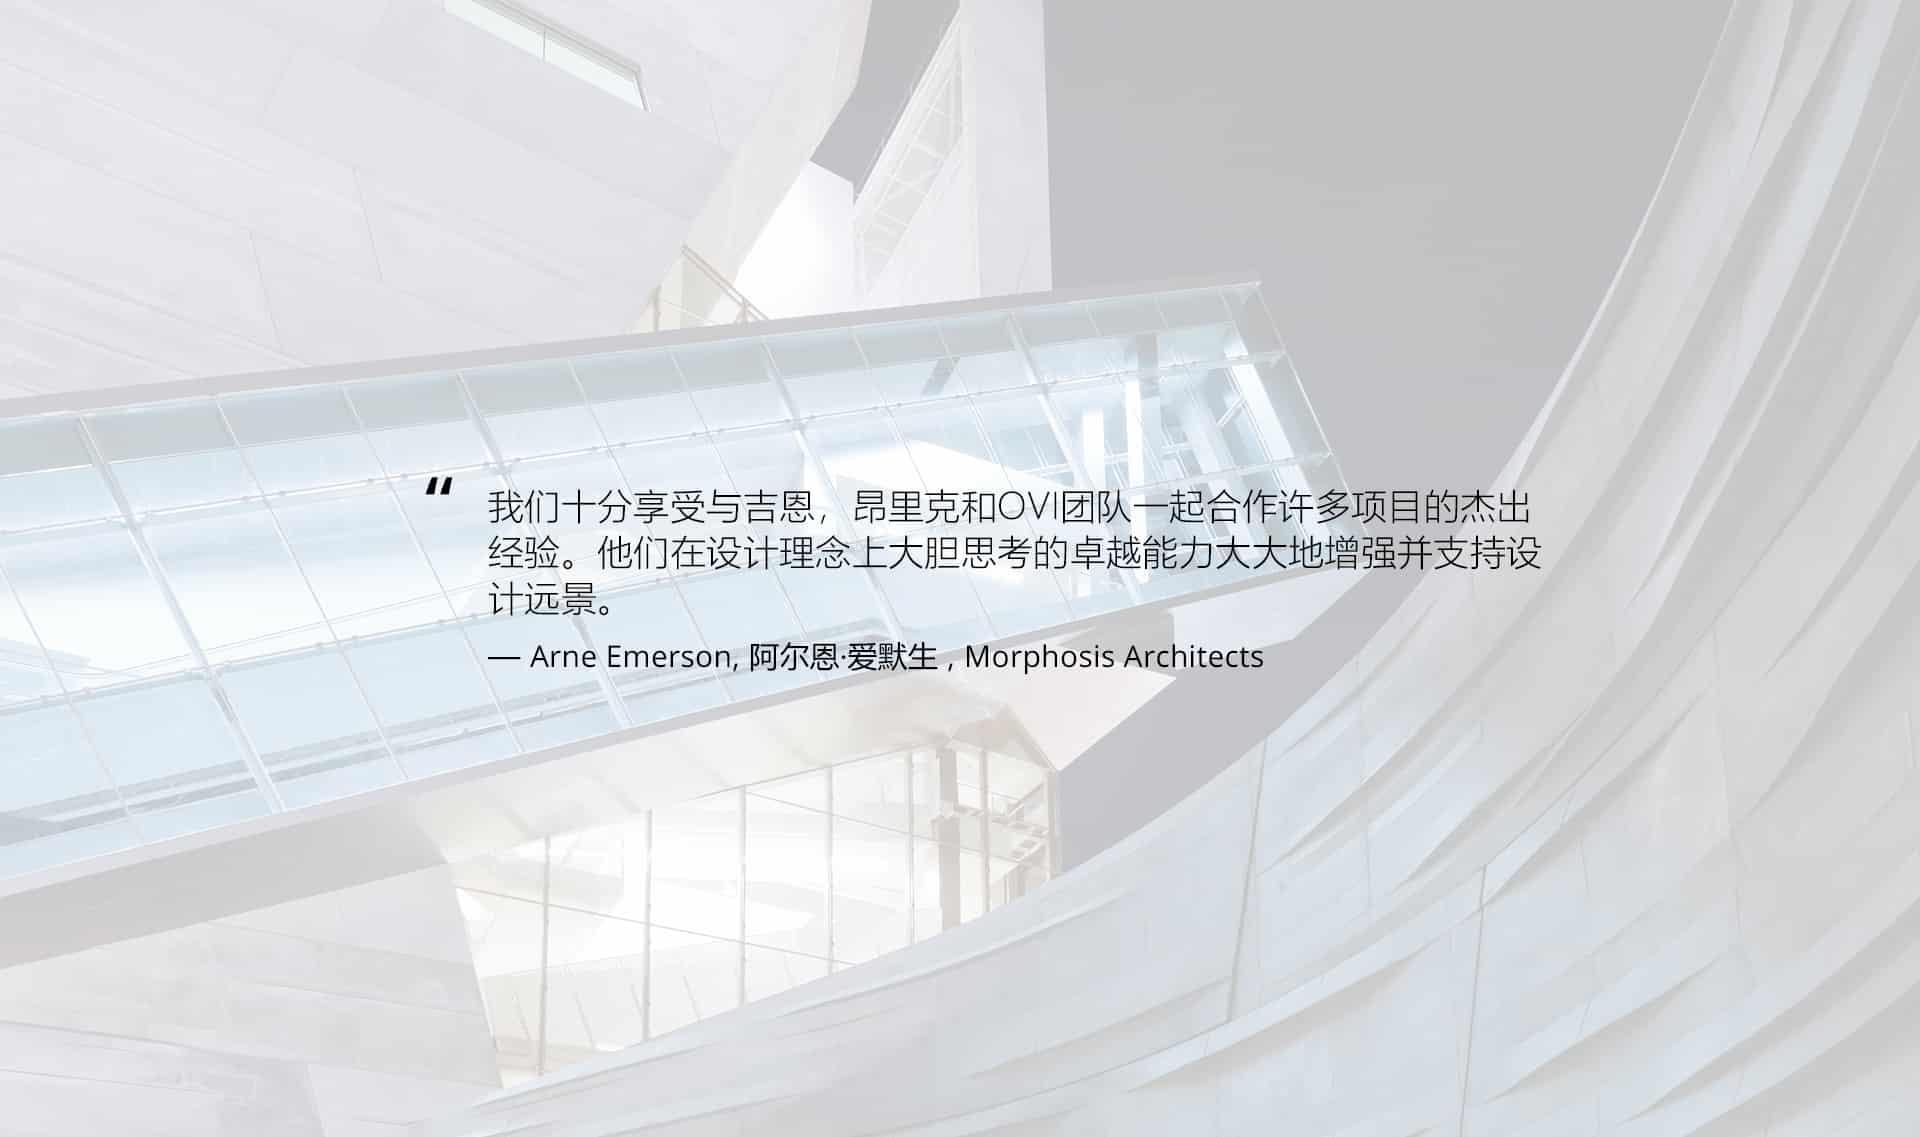 Arne Emerson Tetimonial chinese